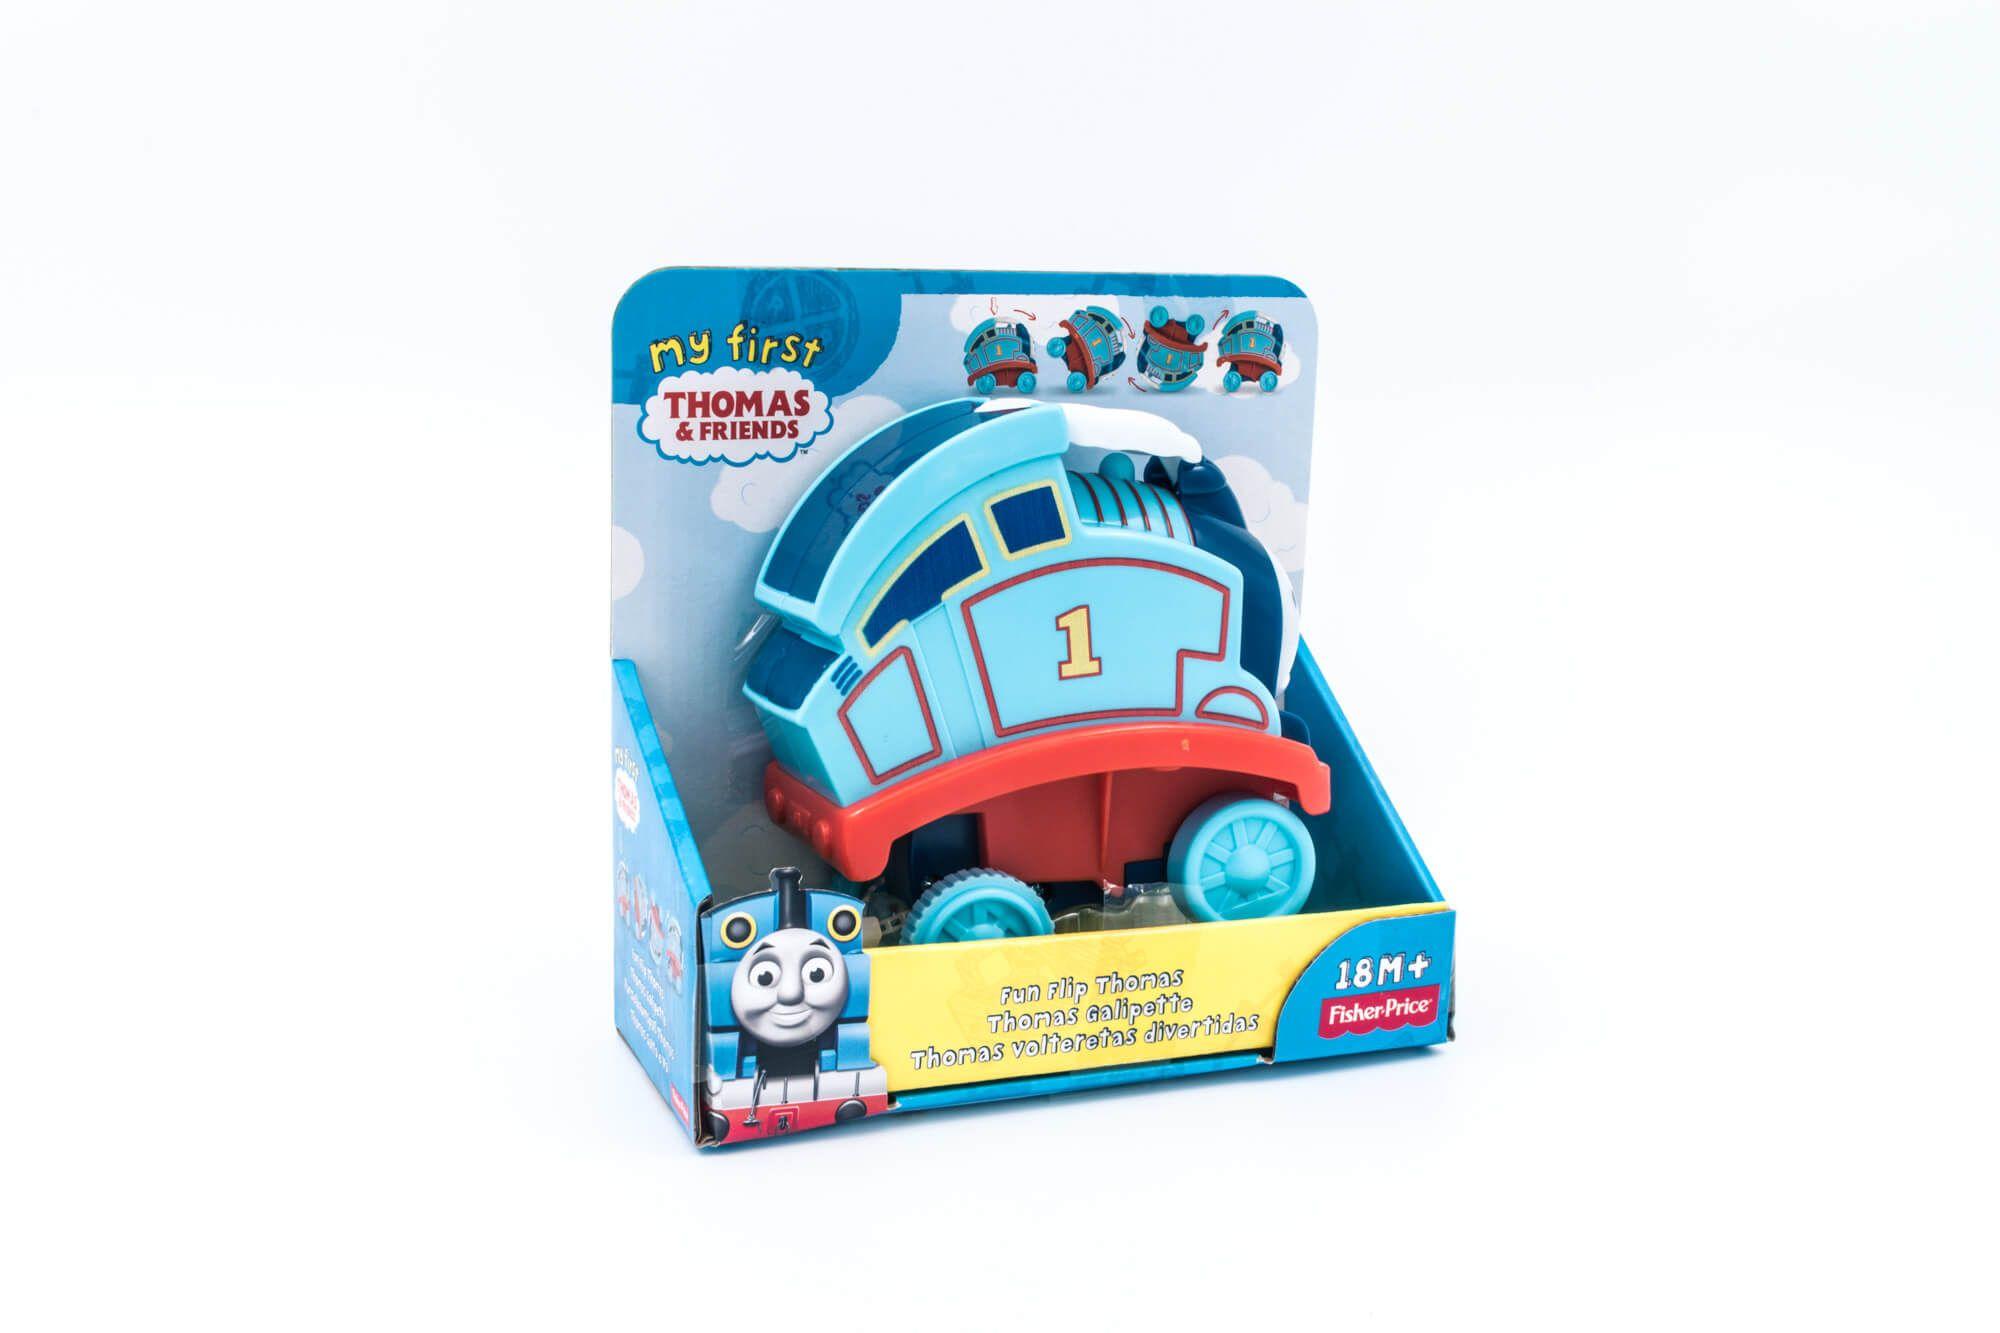 Thomas i drugari lokomotiva